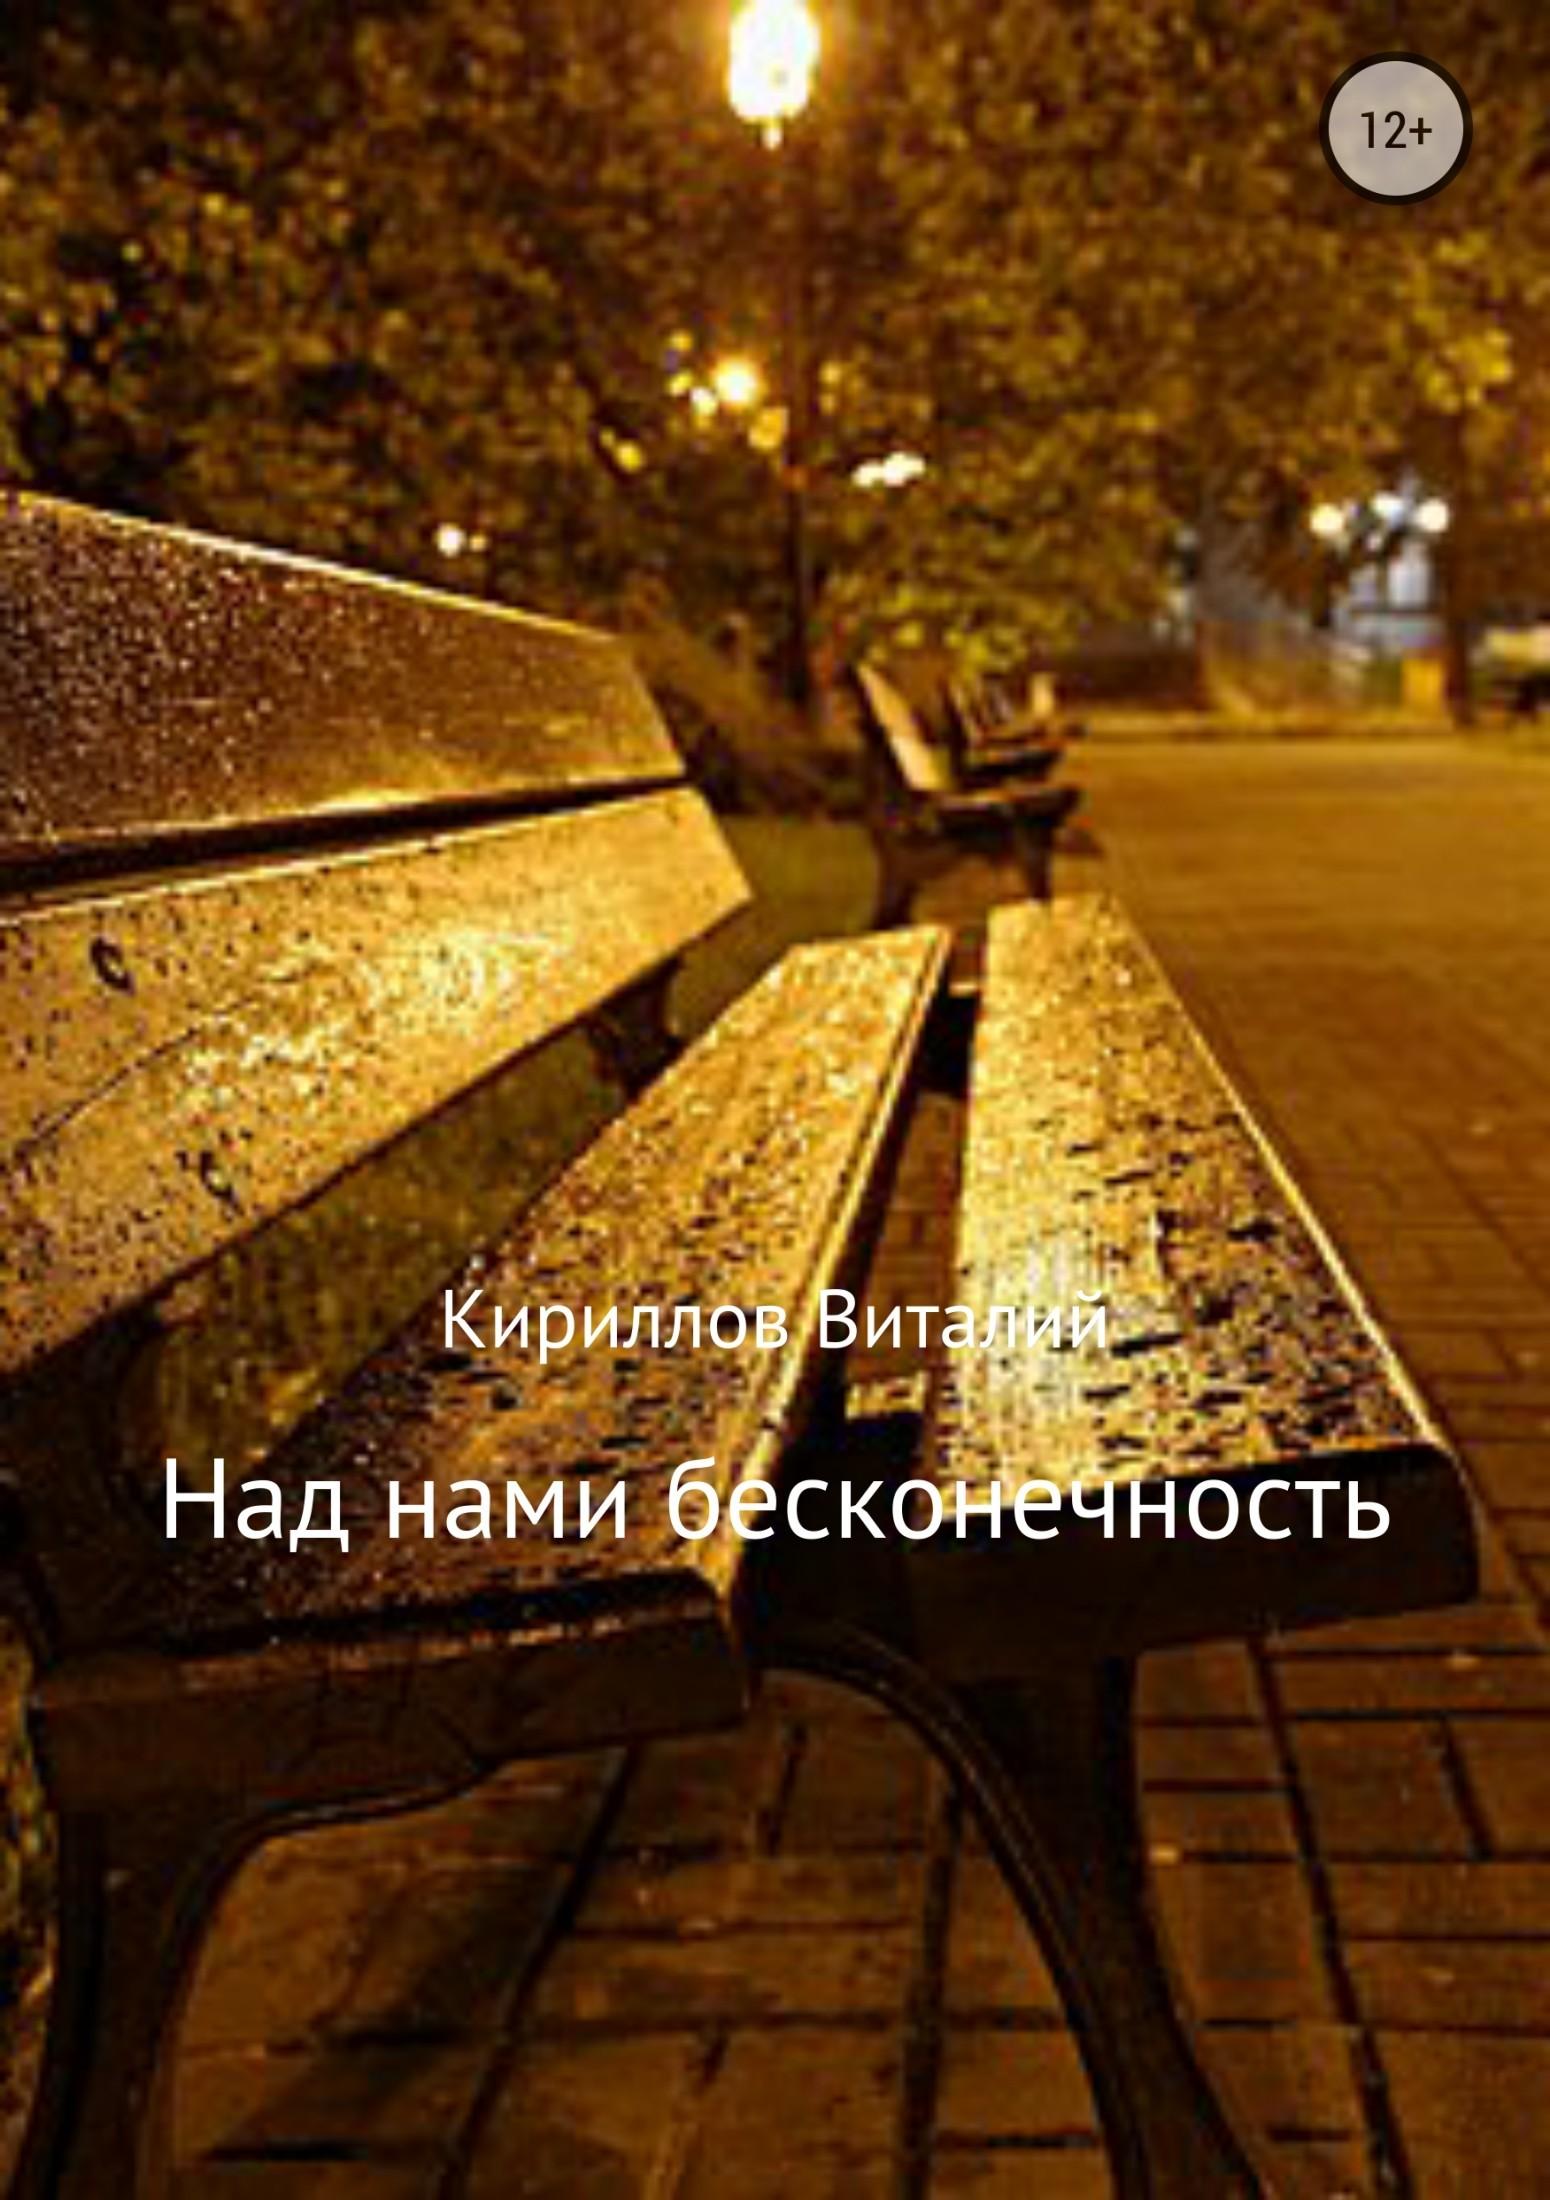 Виталий Александрович Кириллов Над нами бесконечность виталий александрович кириллов я ехал на поезде в нью йорк